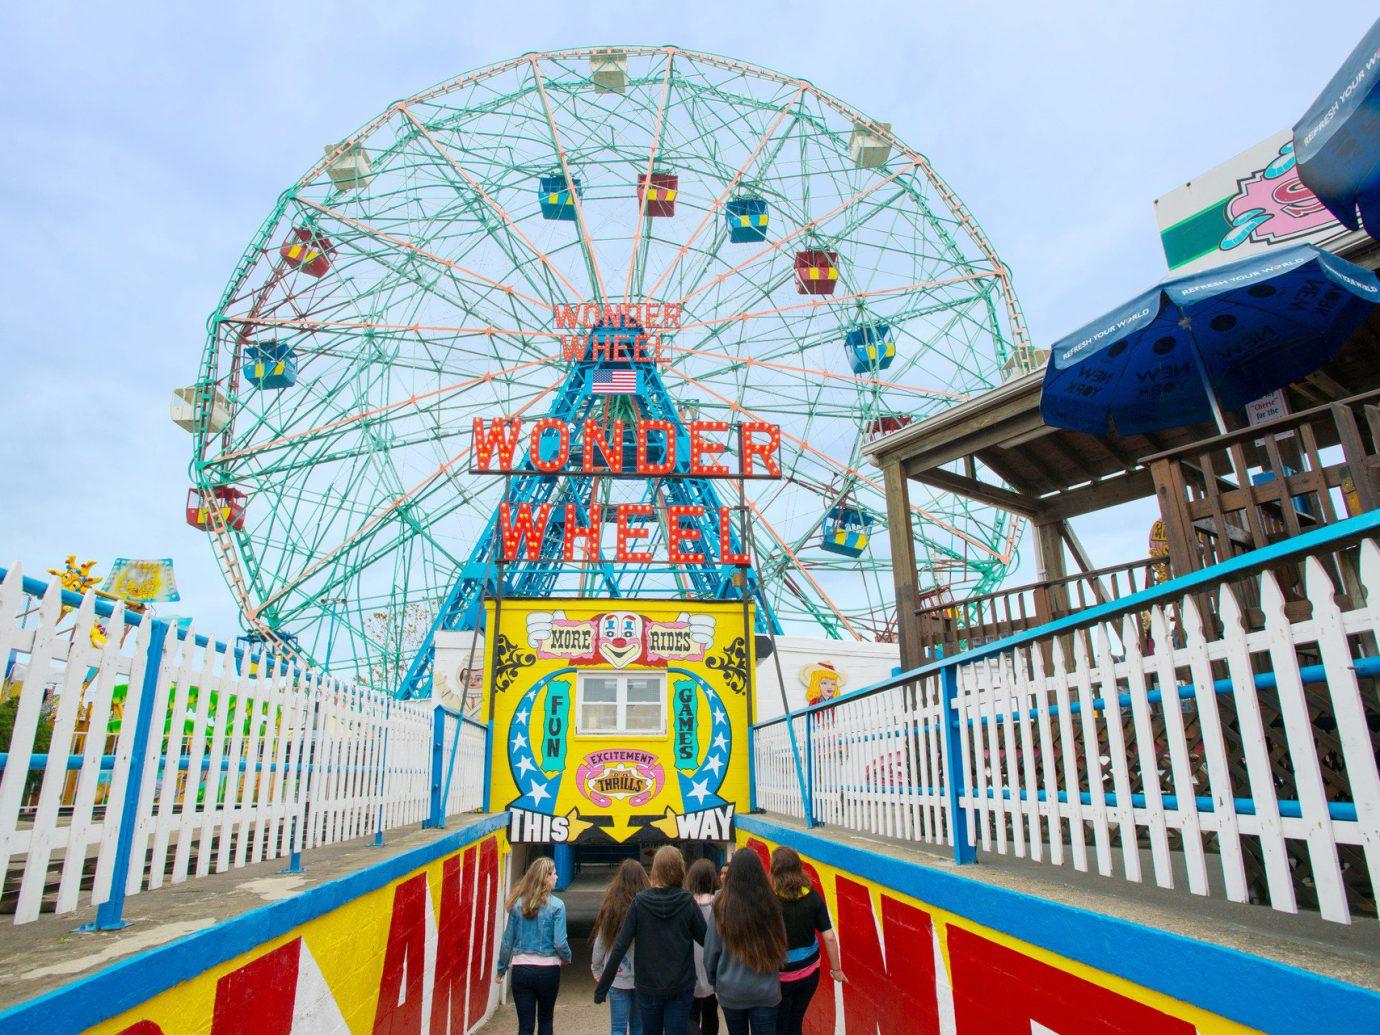 Trip Ideas sky amusement park outdoor amusement ride park ferris wheel leisure fair roller coaster recreation outdoor recreation colorful nonbuilding structure tourist attraction Carousel festival ride